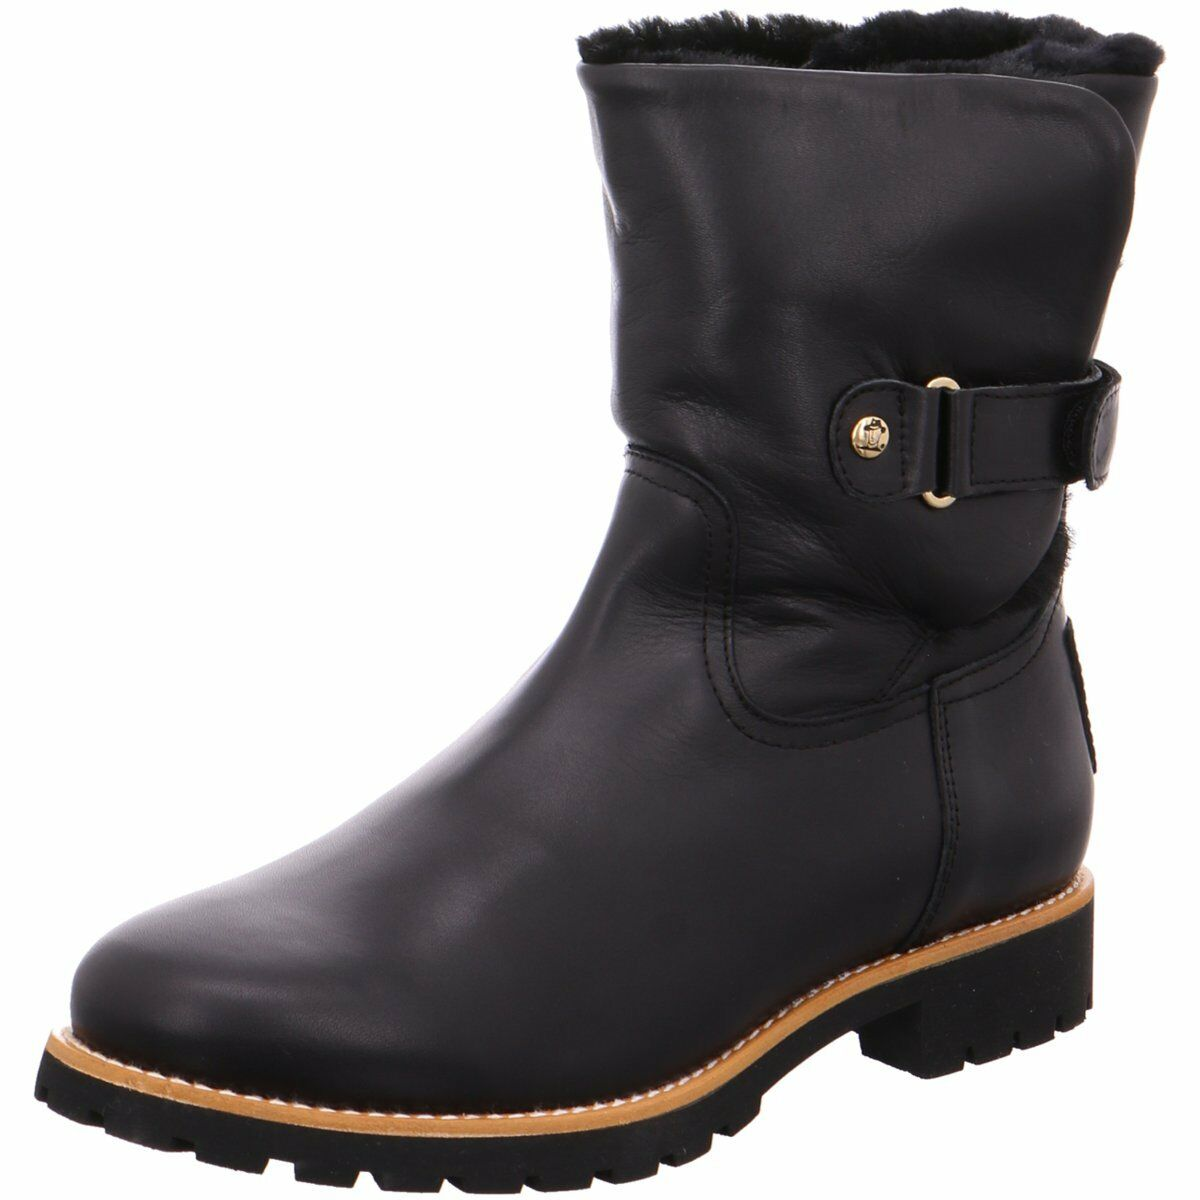 Panama Jack Damen Stiefeletten -88 Felia Igloo Travelling B2 schwarz schwarz schwarz 365247   84d2ed